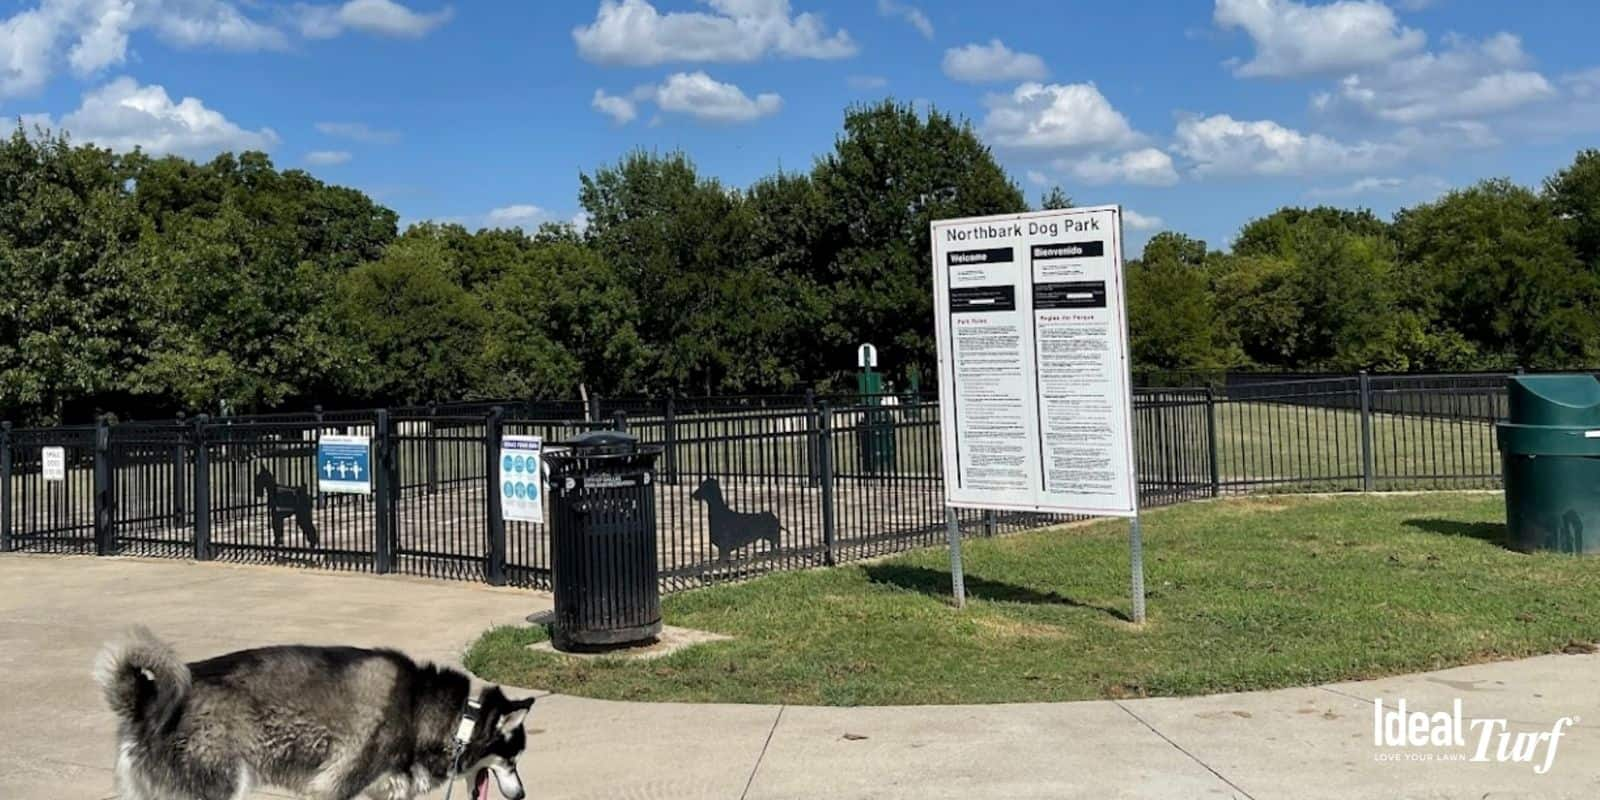 2. Northbark Dog Park